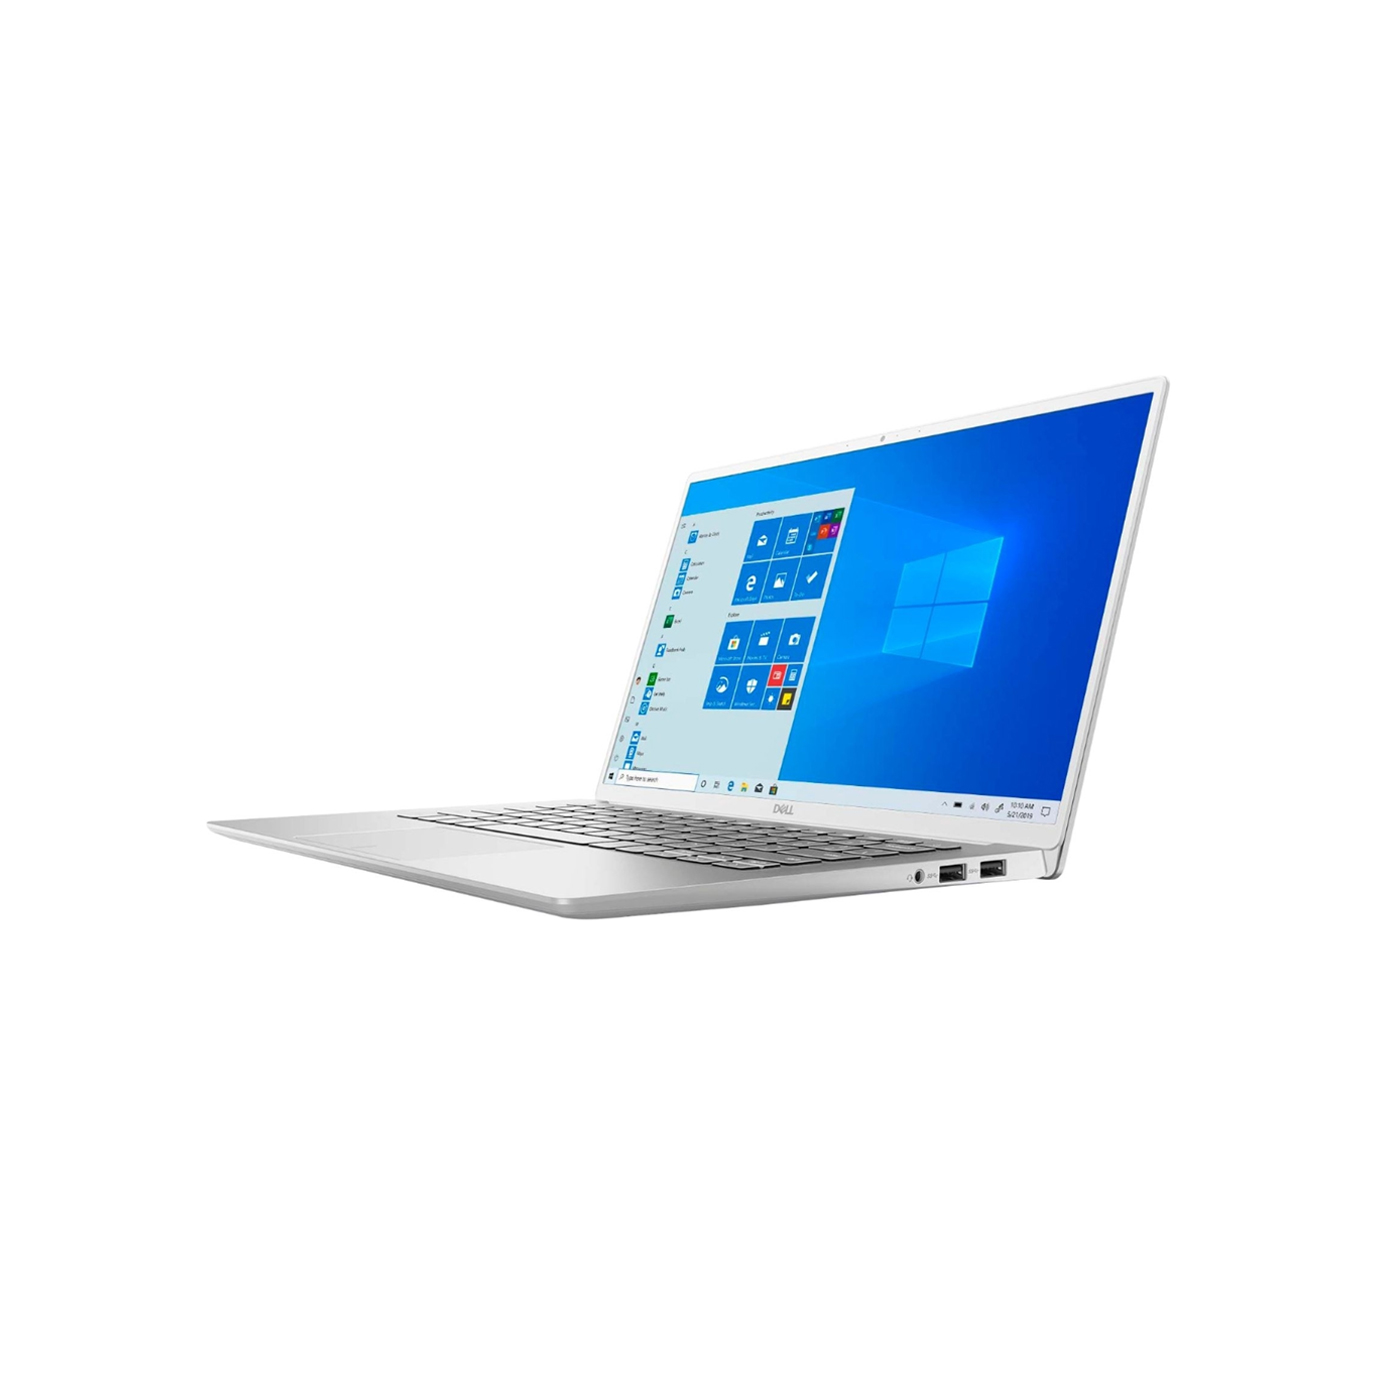 Laptop Dell Inspiron 7490 Core i7-10510U / 8GB / 512GB / Full HD / Win 10 / Silver - Hàng Nhập Khẩu Mỹ